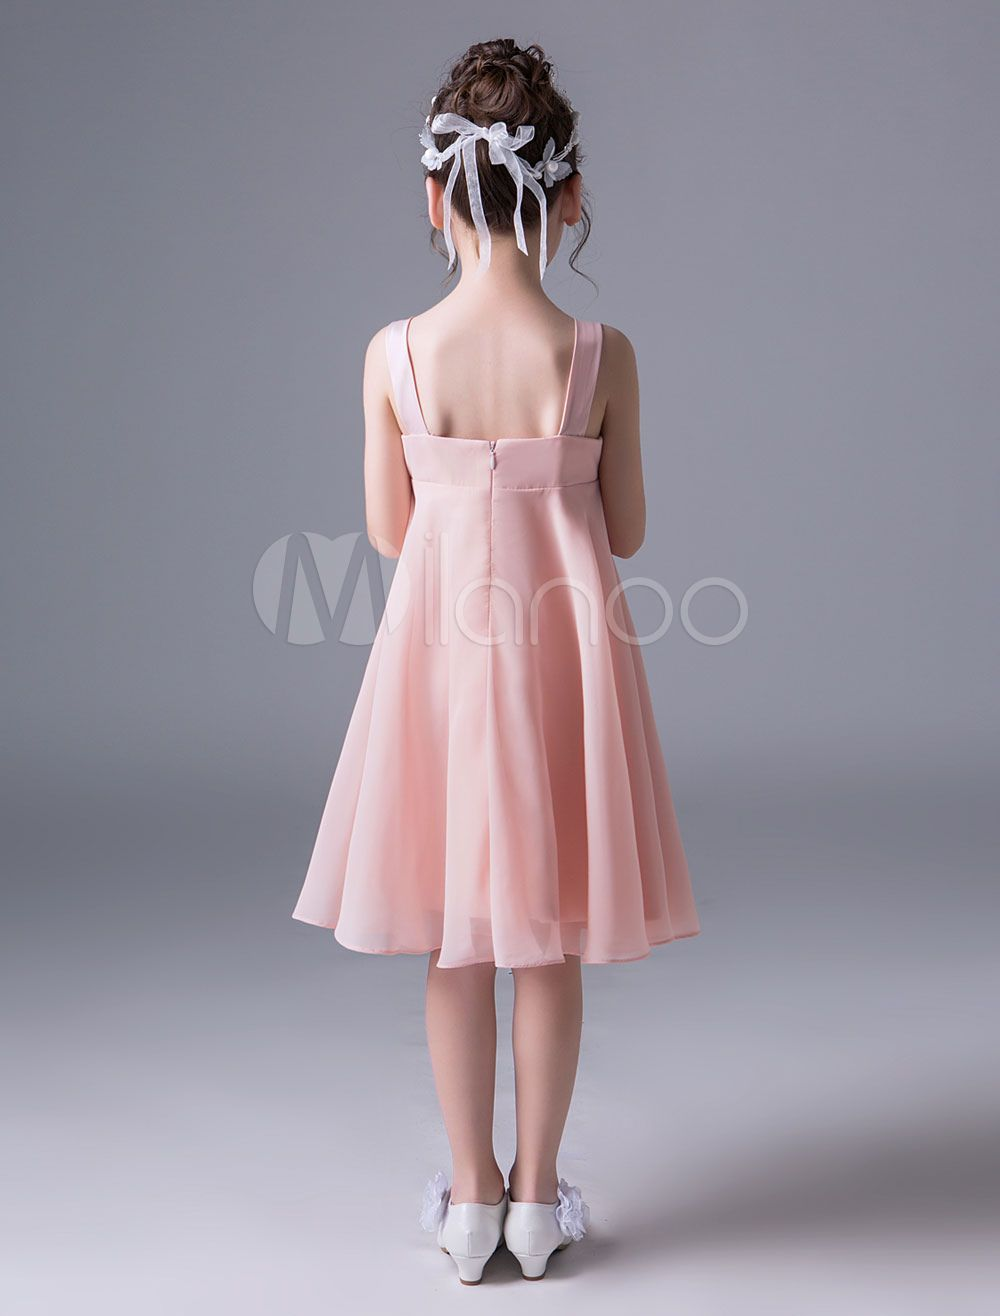 chiffon flower girl dresses pink